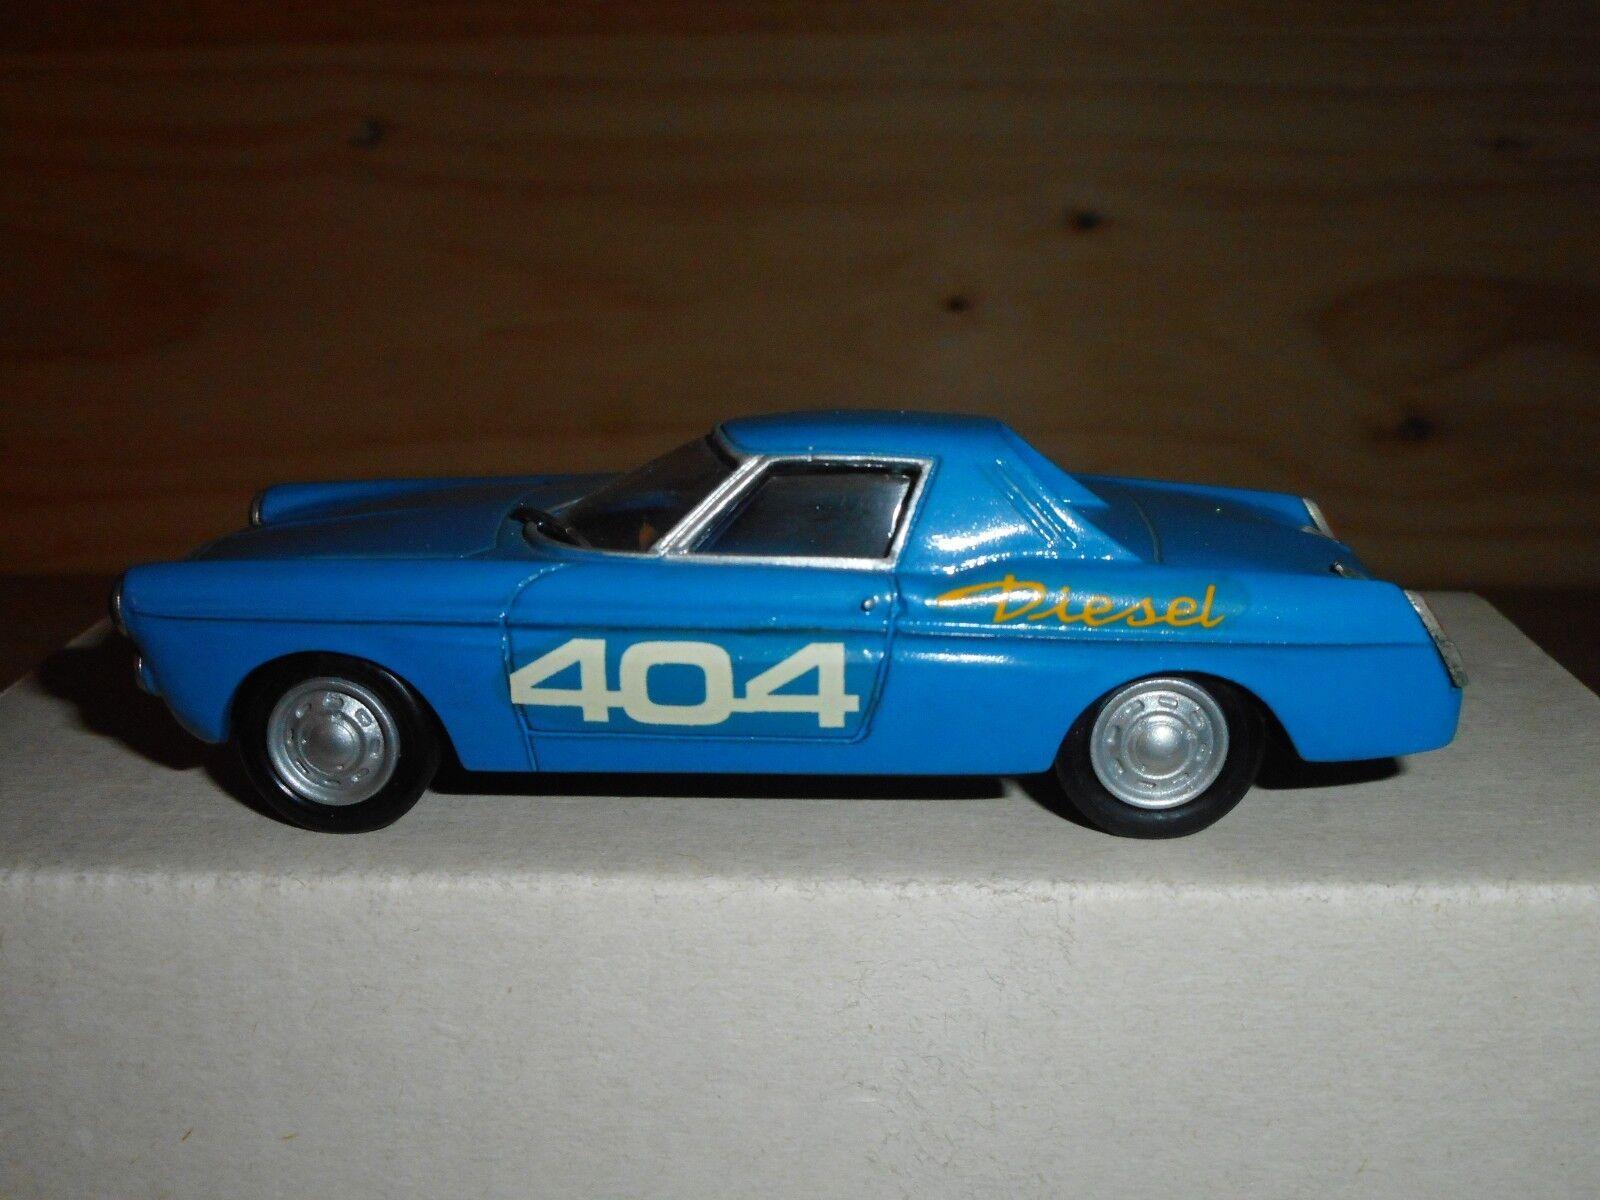 PEUGEOT 404 DIESEL record 1965 1 43   RETRO BOLIDE     résine vintage  SUPERBE